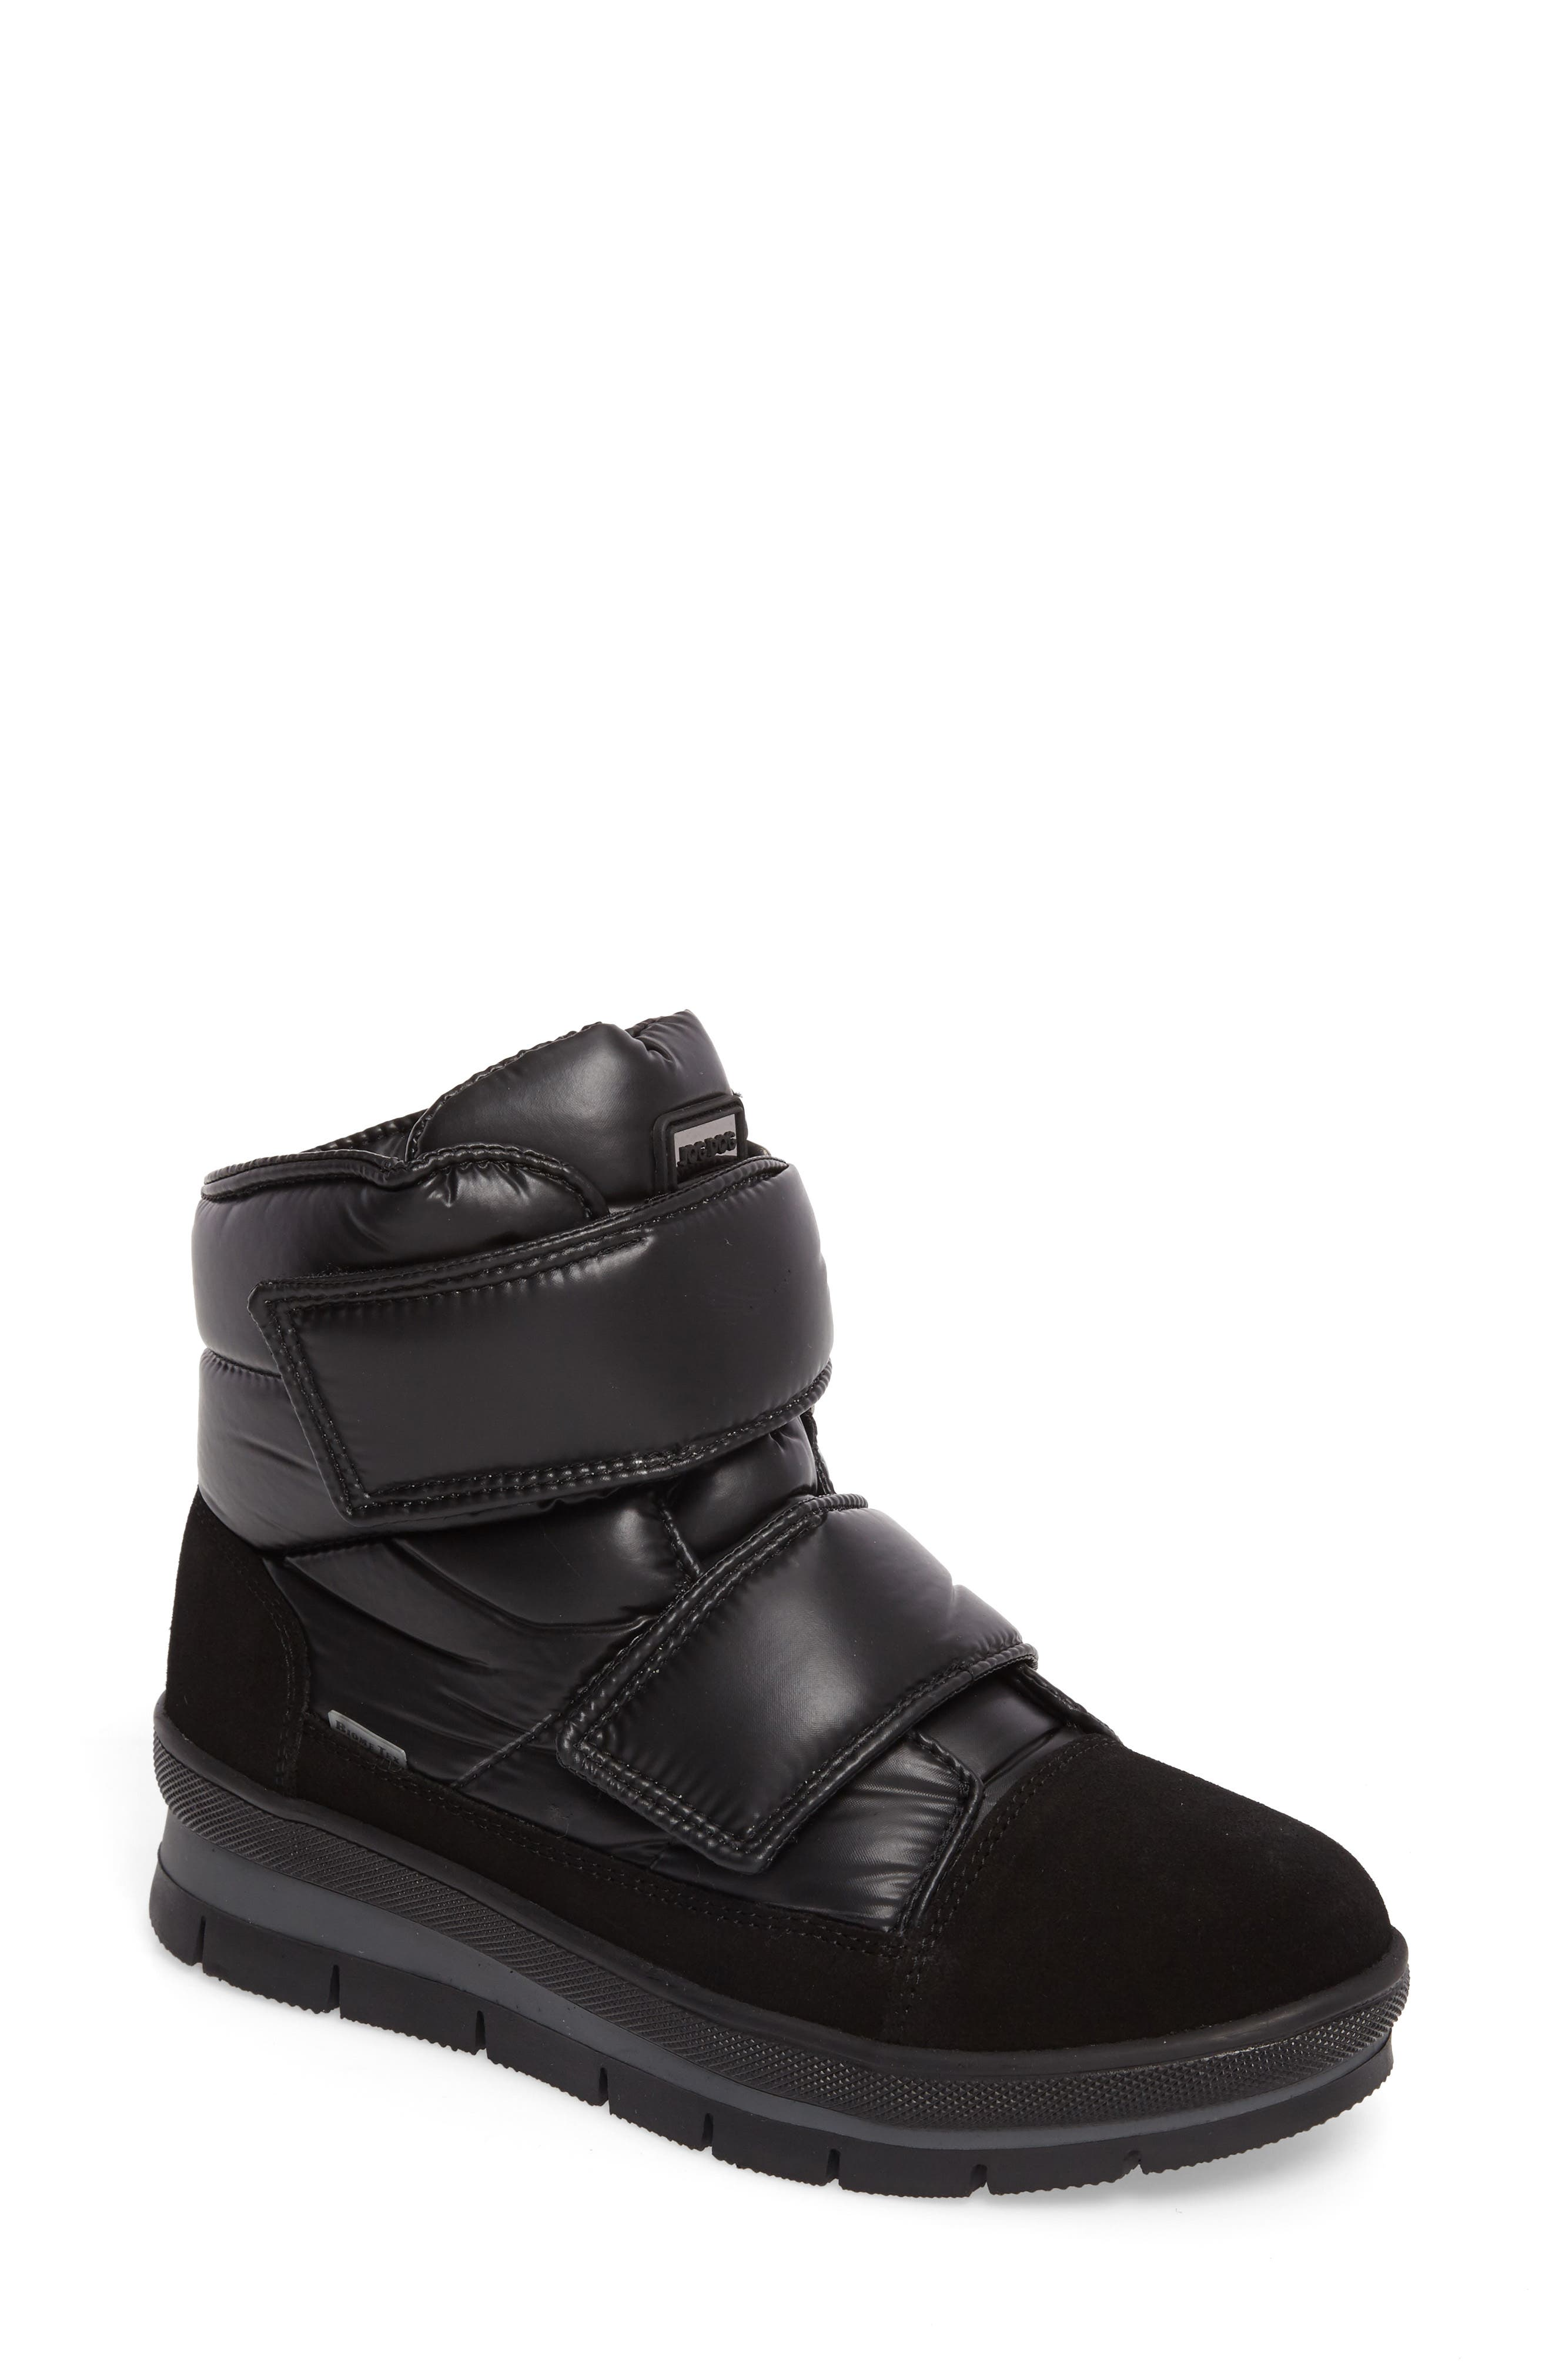 Gran Sasso Waterproof Boot,                         Main,                         color, Black Baltico